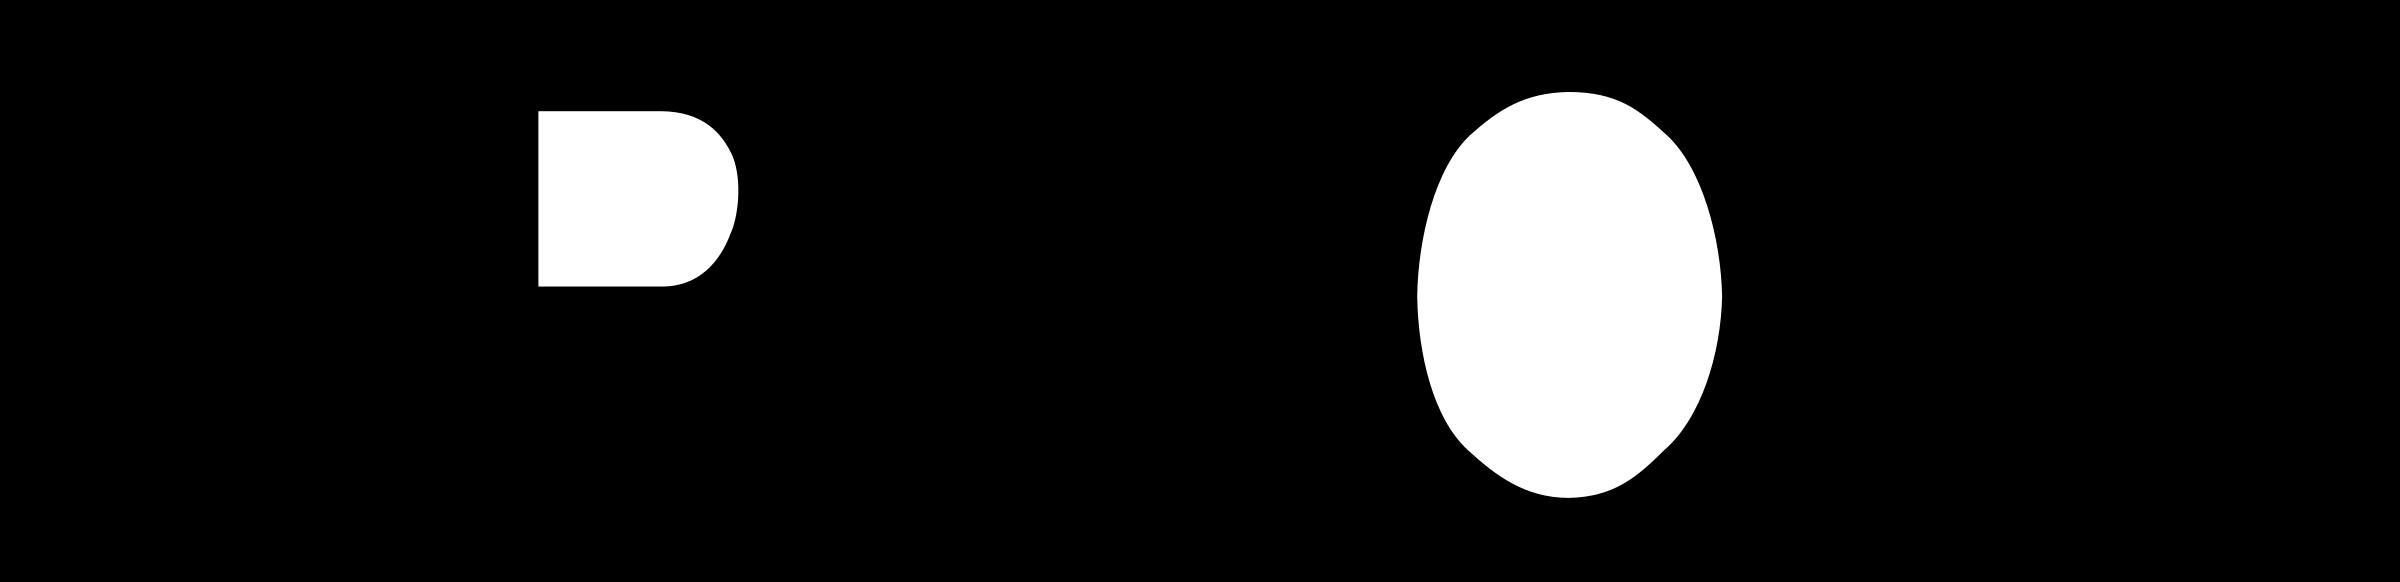 epson-1-logo-png-transparent